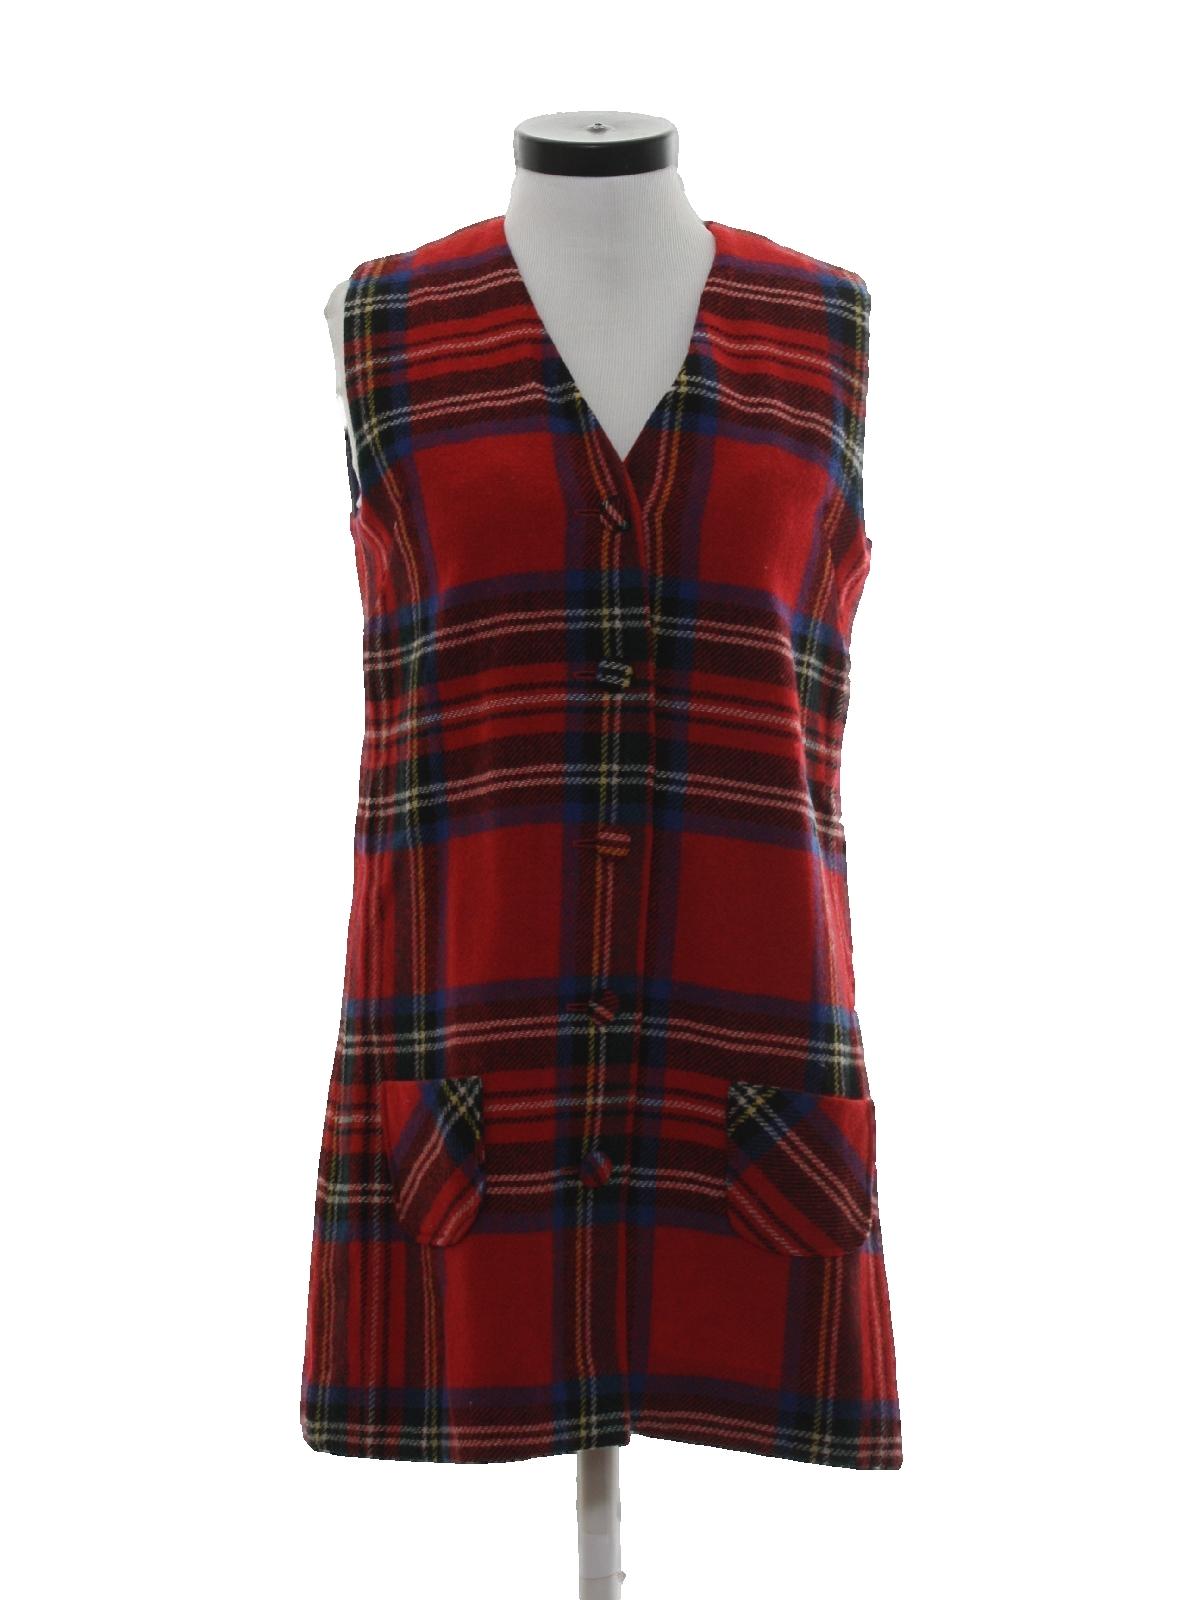 1960 s Retro Dress  60s -Nordstrom Best- Womens red plaid wool ... c0e23974e